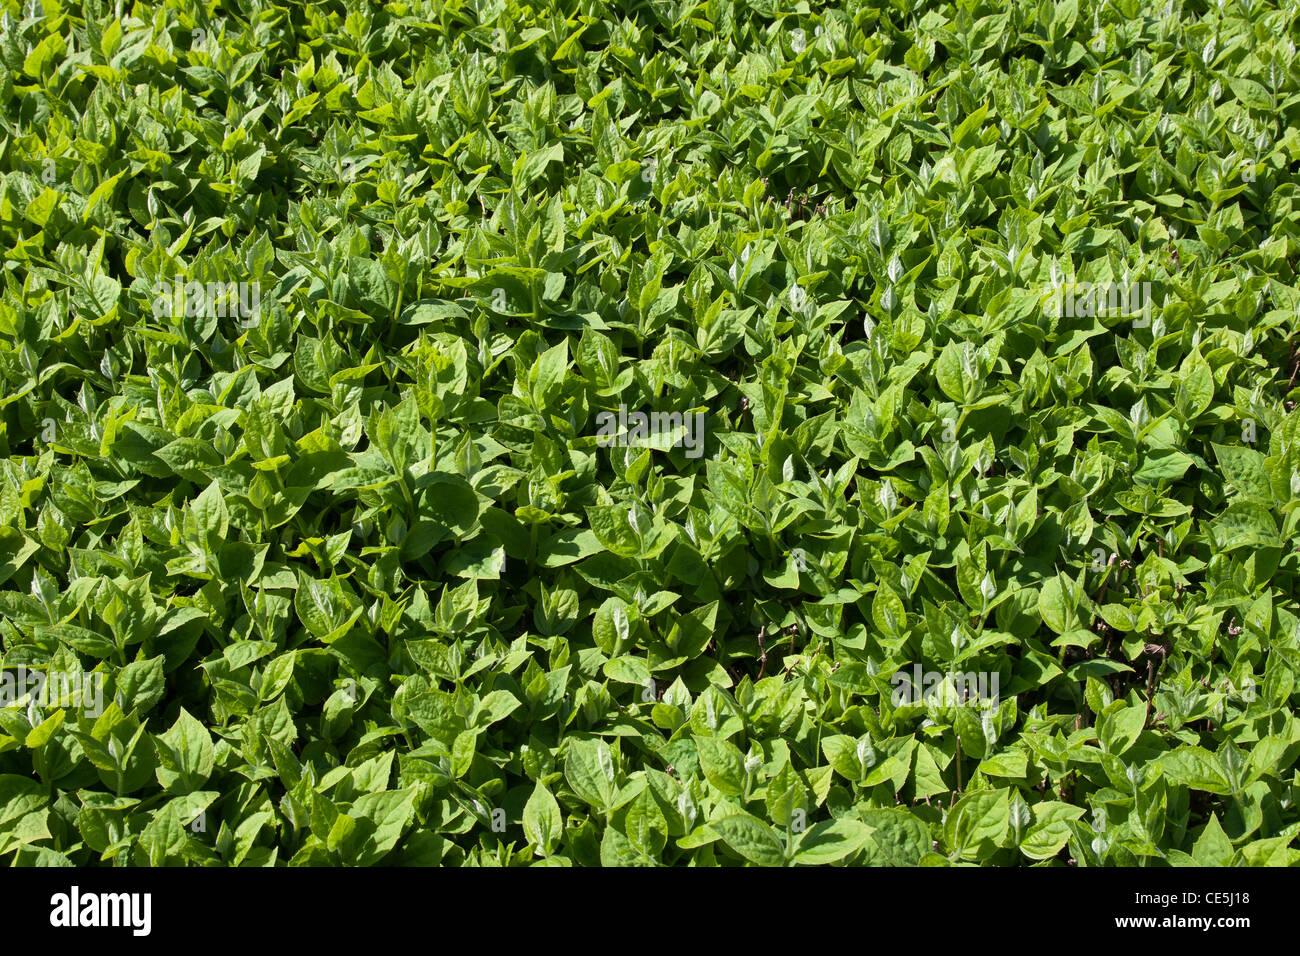 Background From Live Jasmine Philadelphus Coronarius Leaves